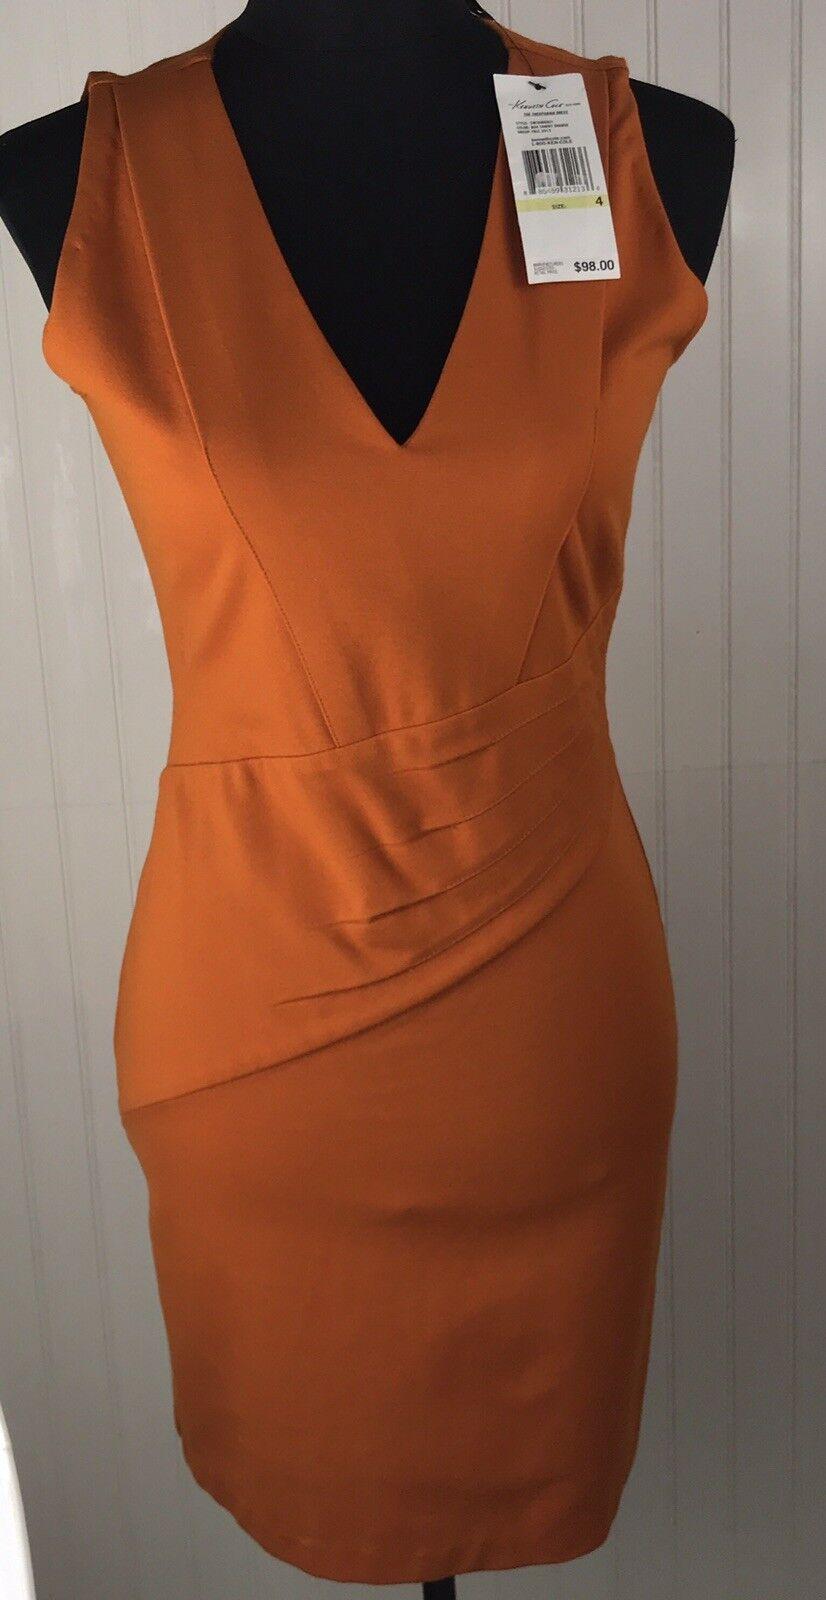 NWT KENNETH COLE NEW YORK THEOPHANIA Burnt orange DRESS SIZE 4